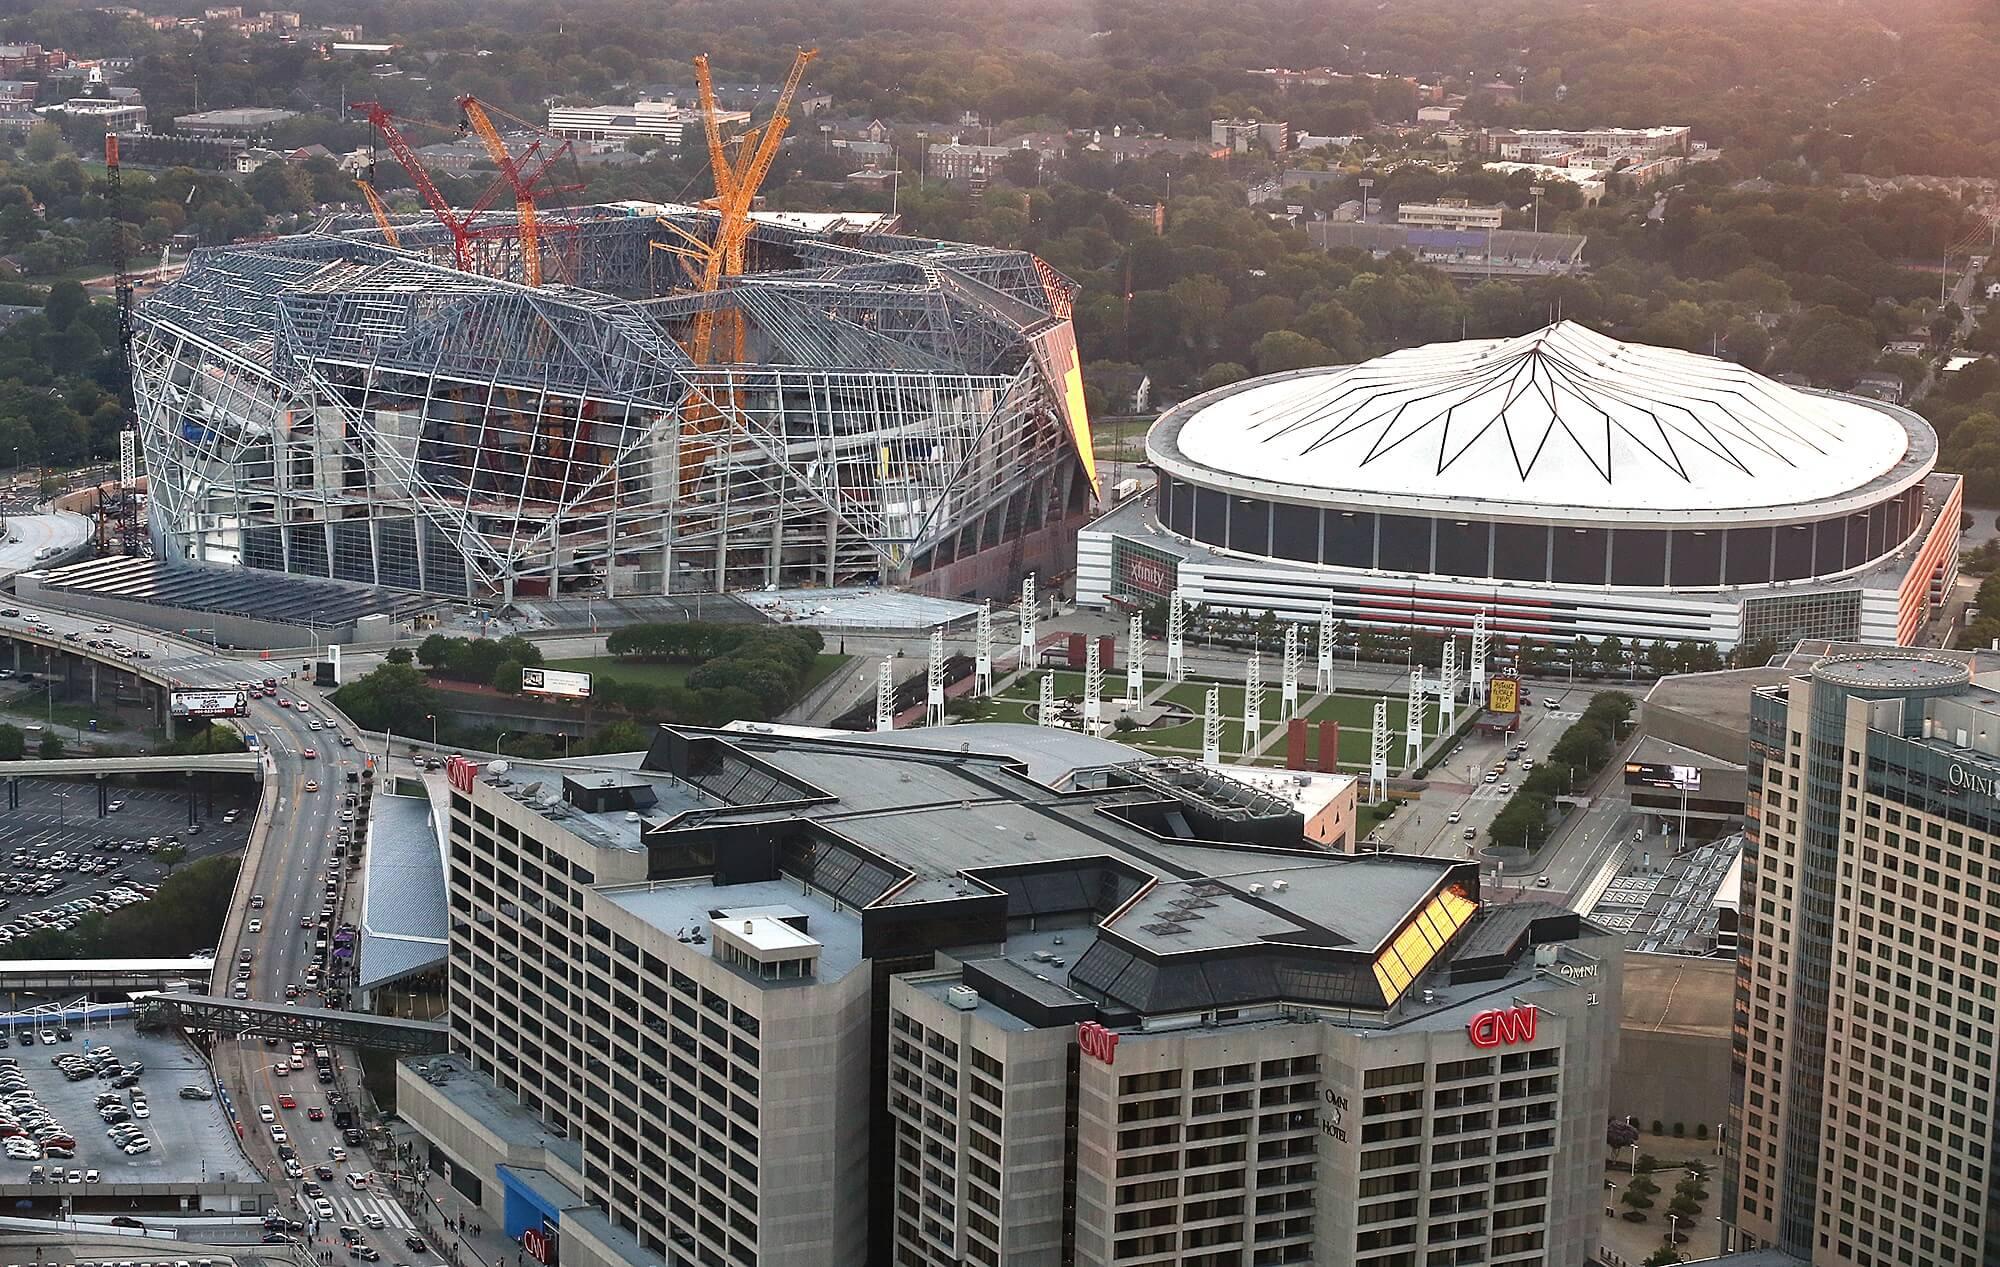 The atlanta falcons new football stadium for Mercedes benz service atlanta